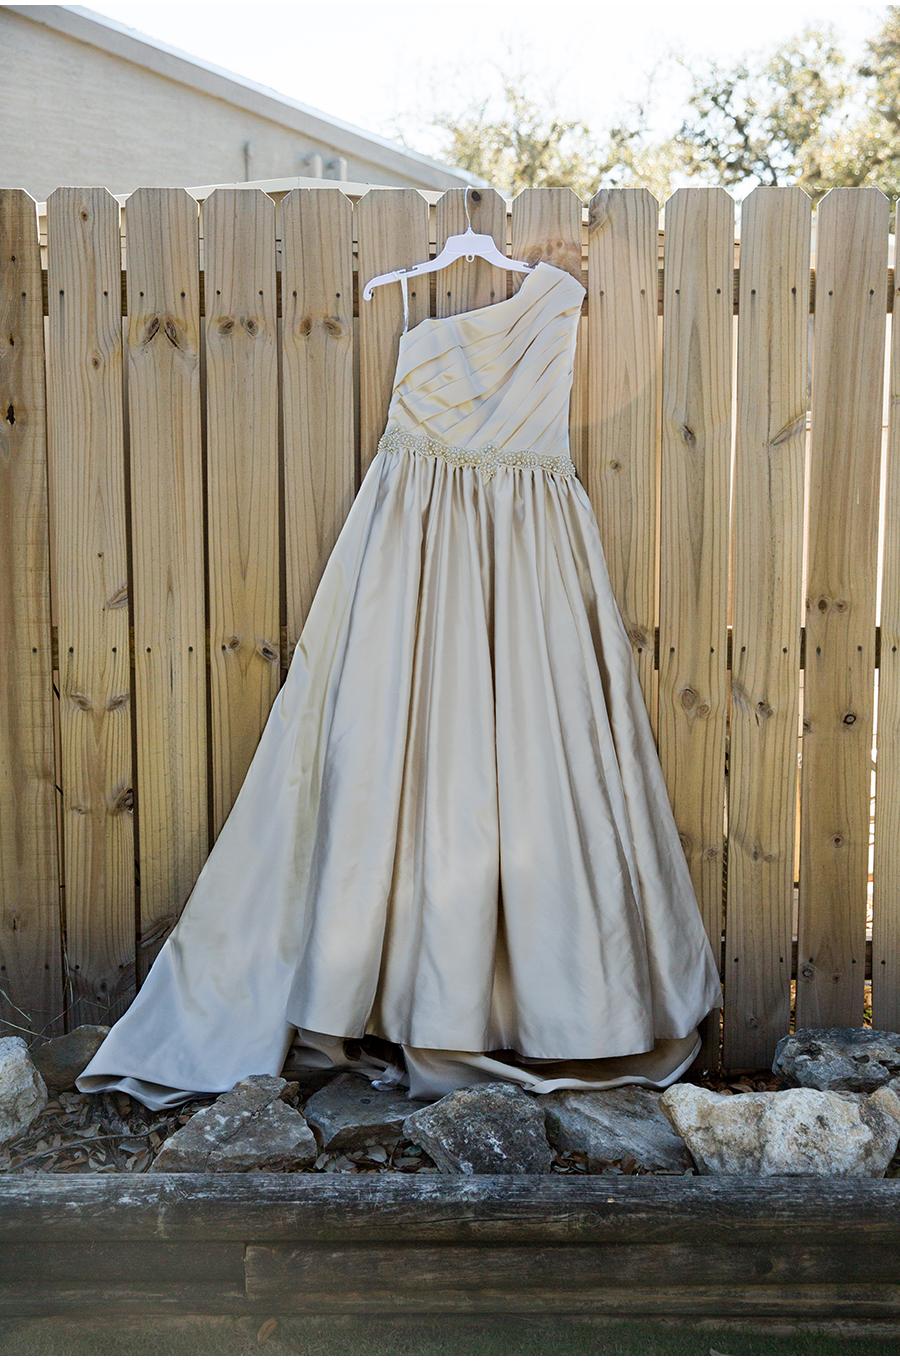 0Stokes-Wedding-002.jpg